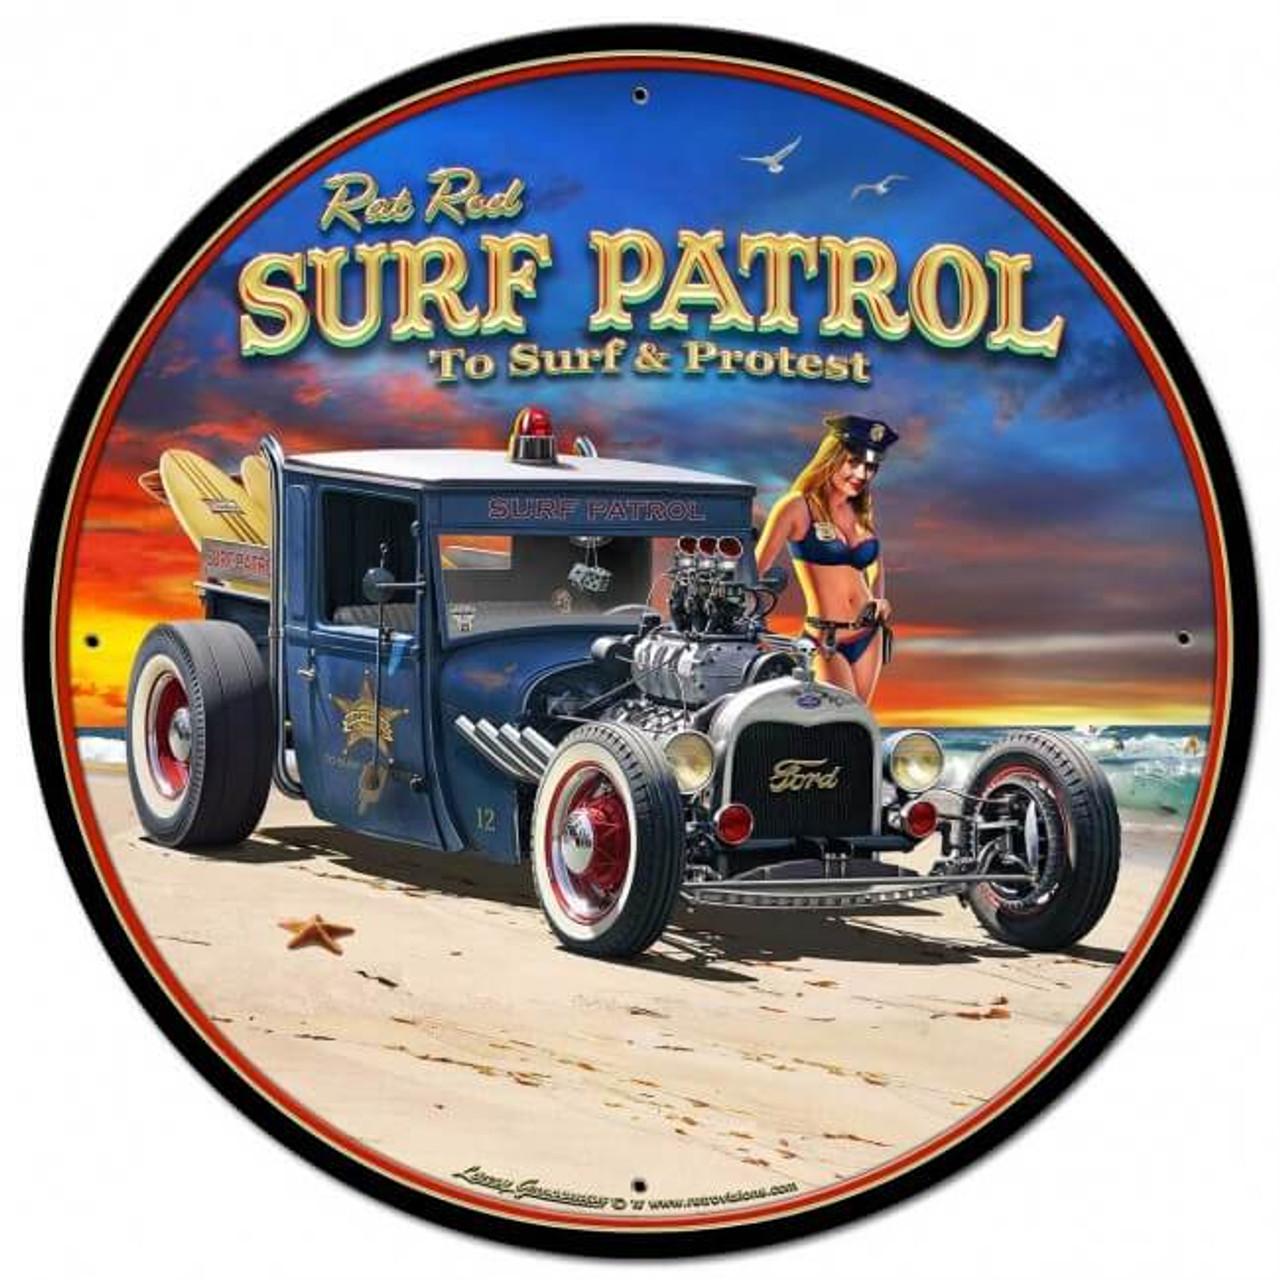 1929 Rat Rod Surf Patrol Metal Sign 28 x 28 inches